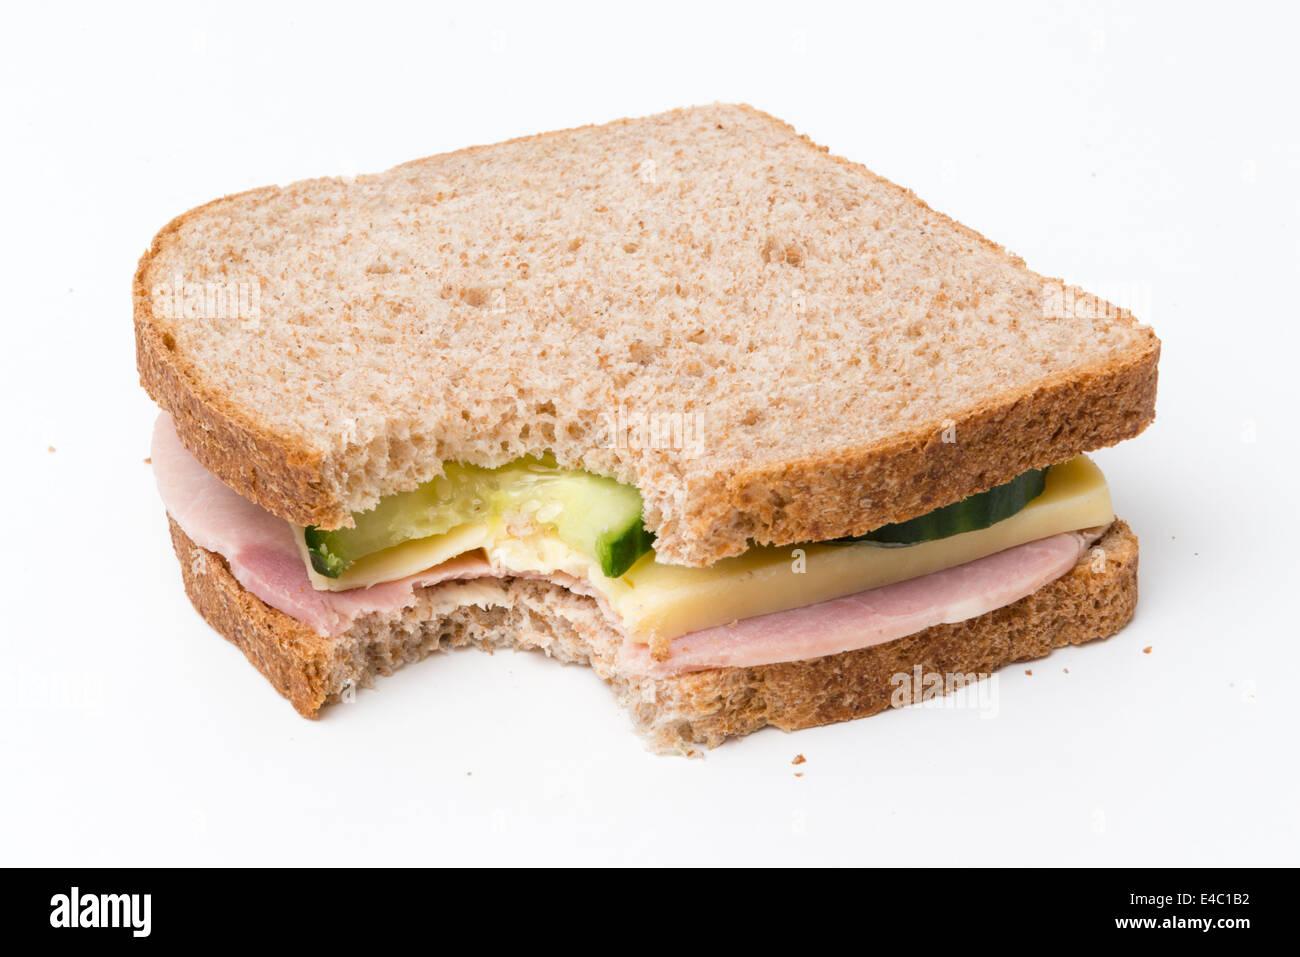 Tasty British sandwich - Stock Image